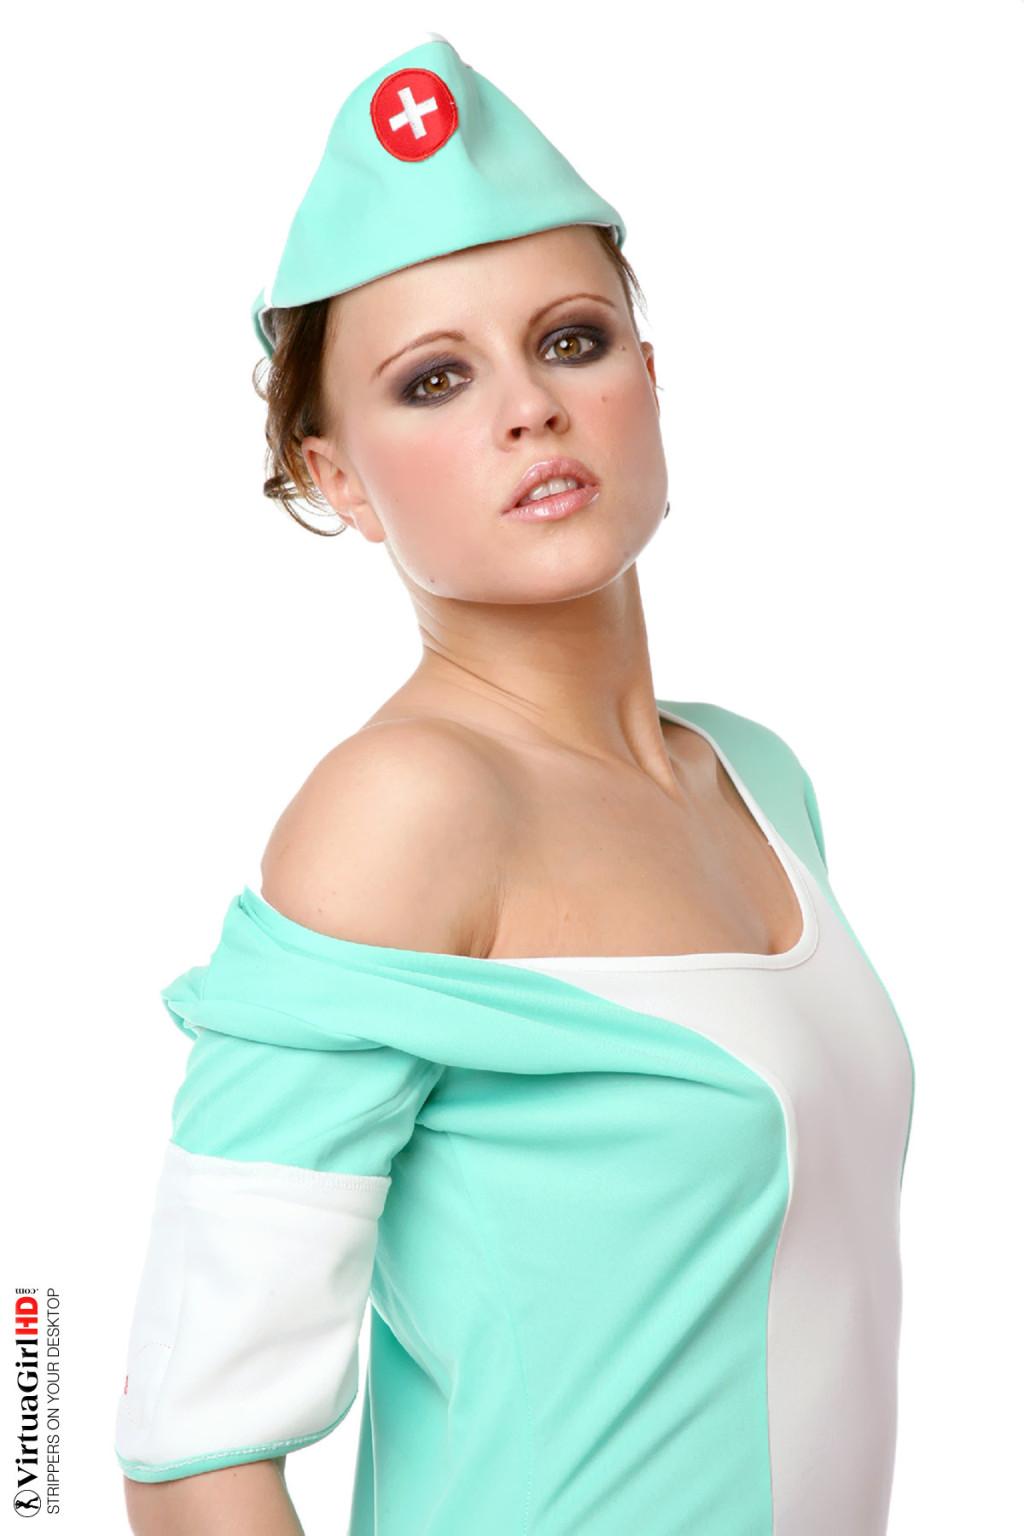 Monica Sweet - Медсестра - Галерея № 2490461